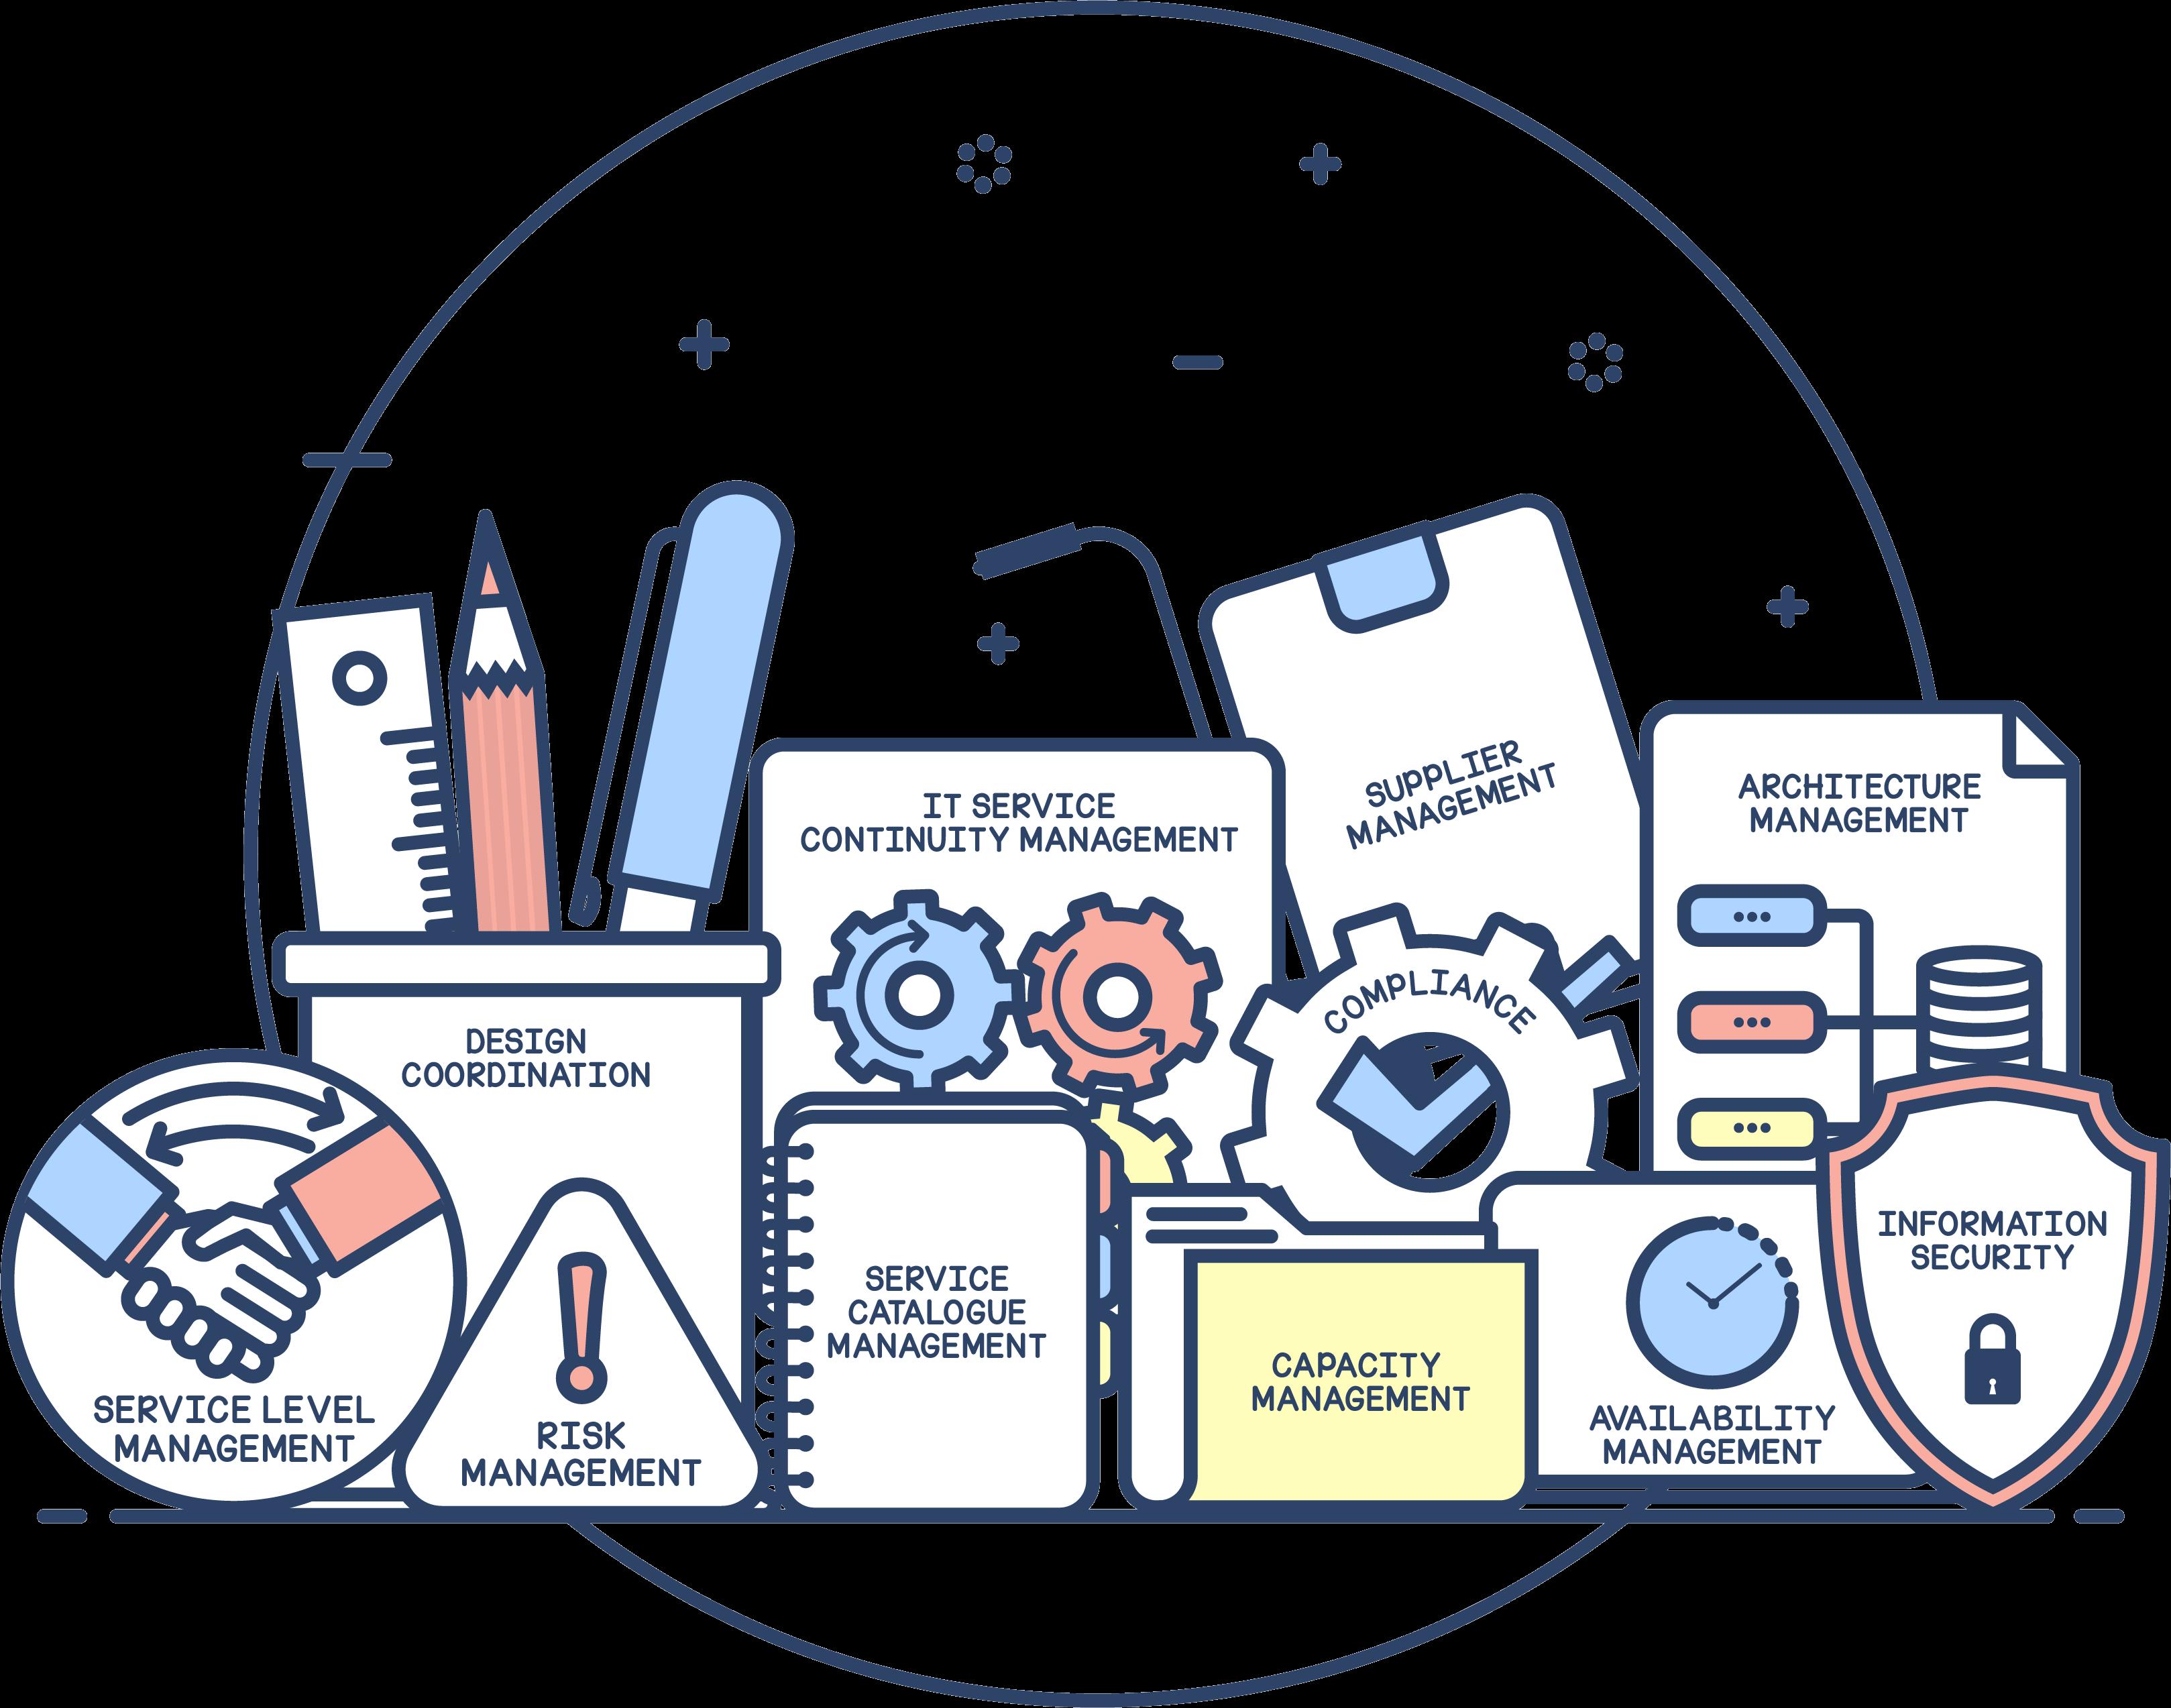 ITIL service design processes